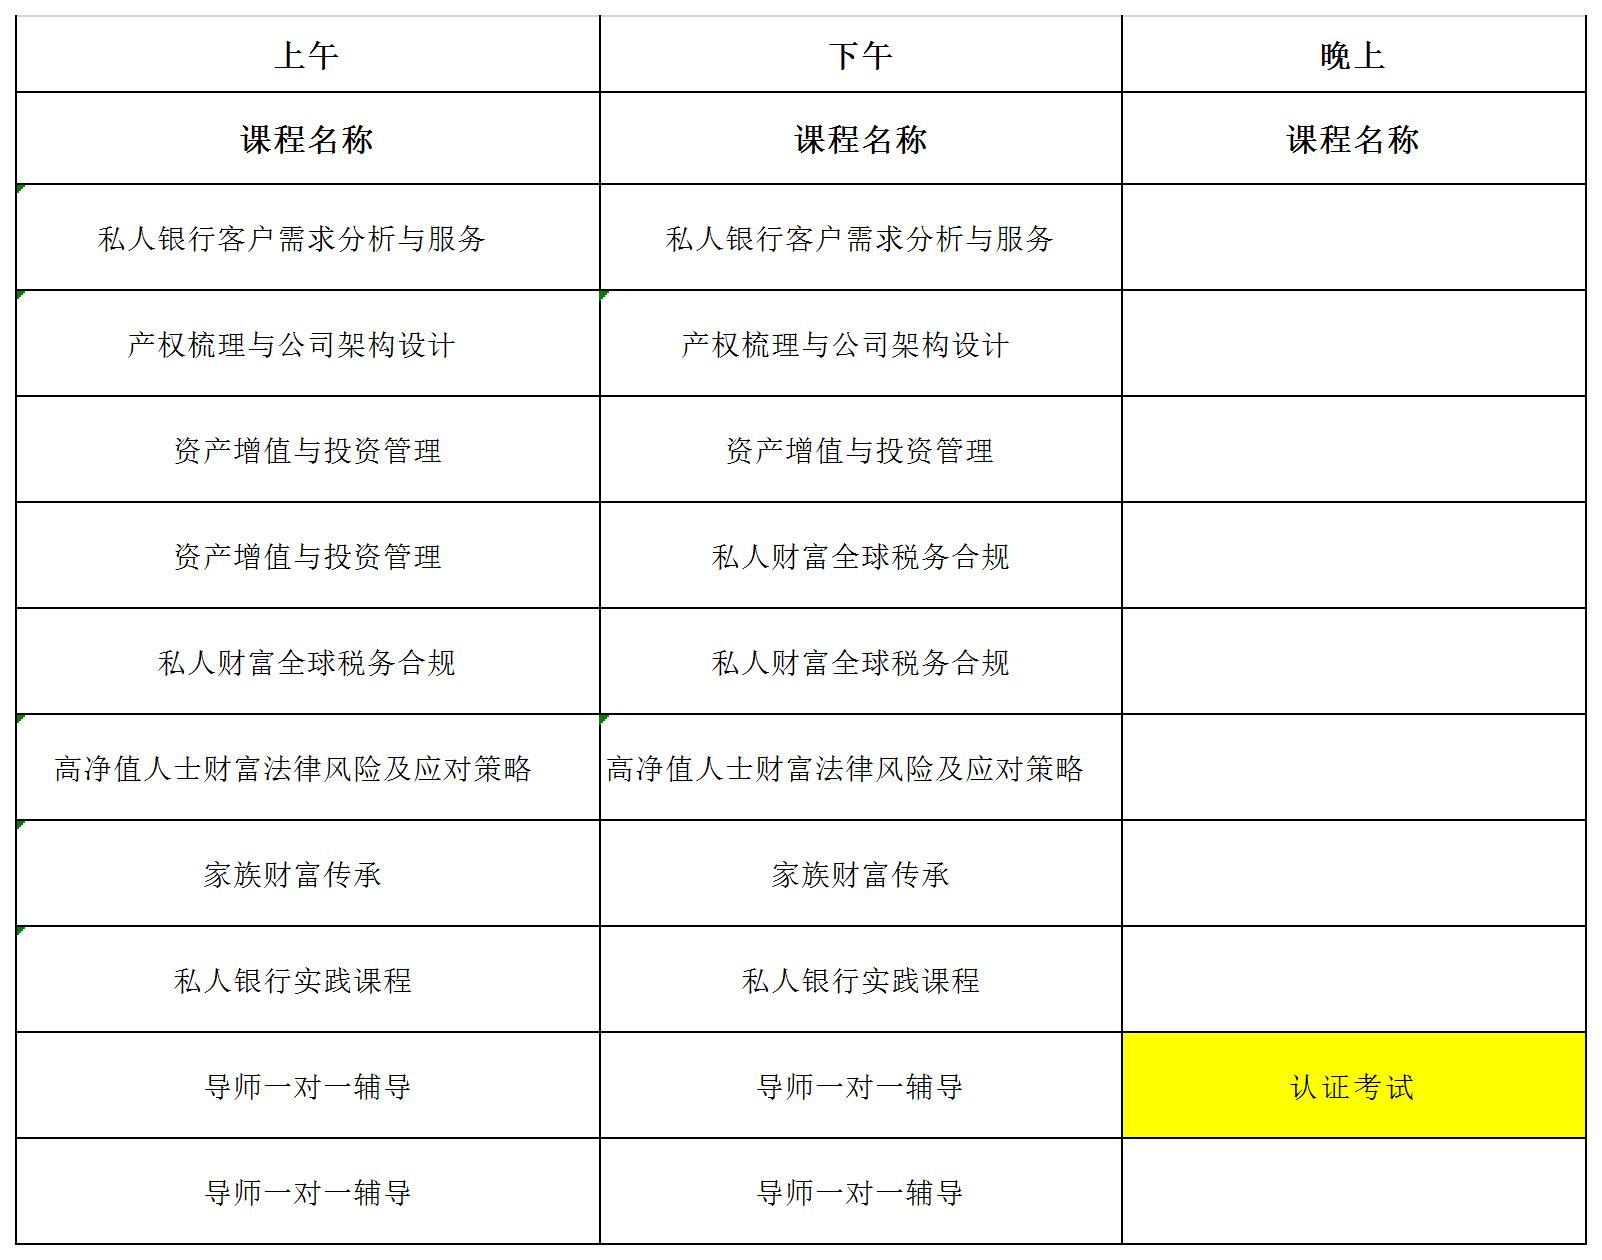 2019年6月上海周末班課表.png